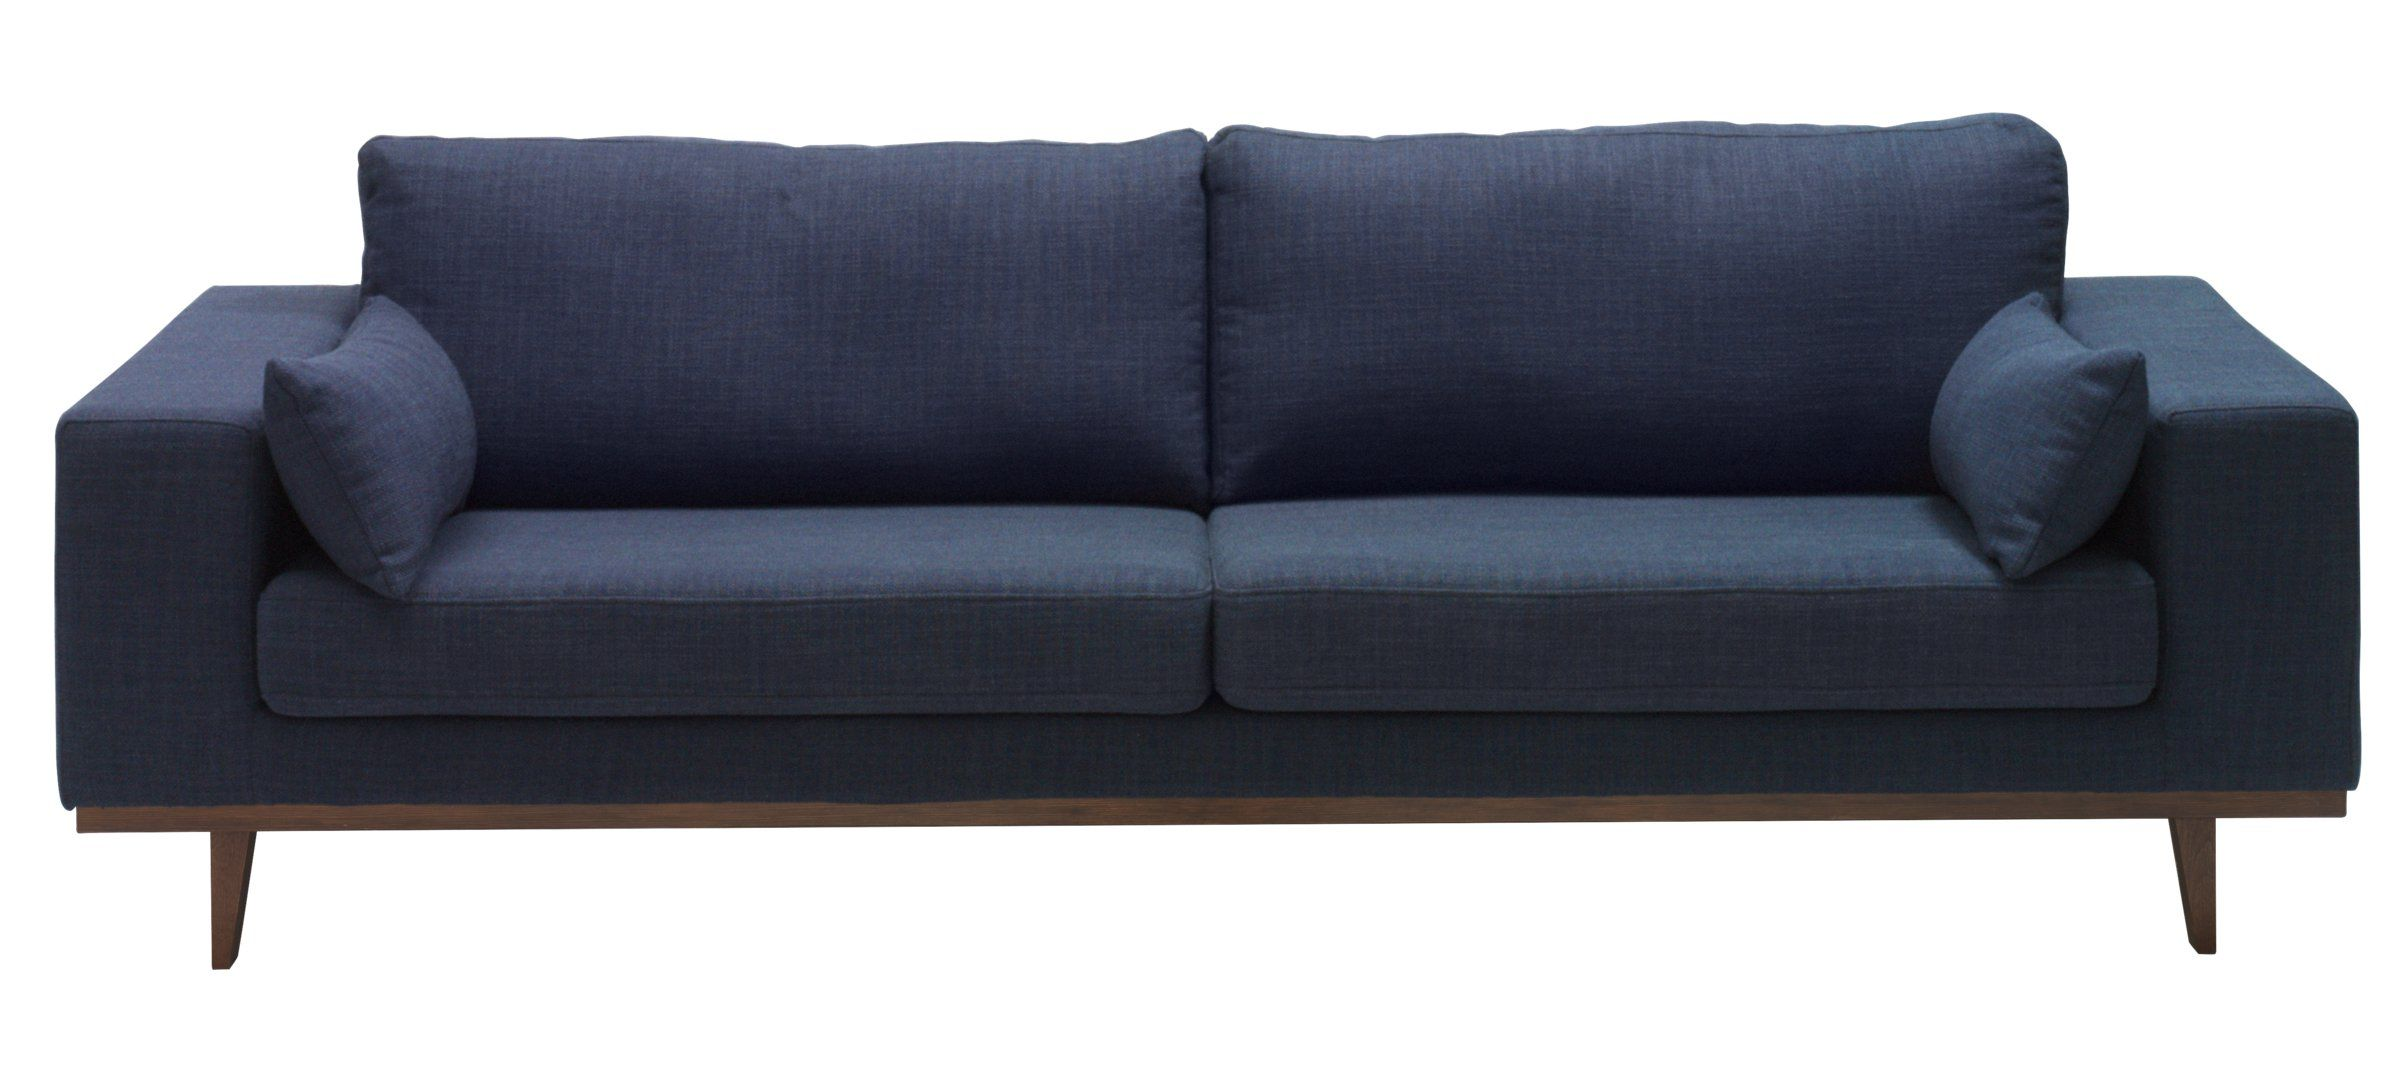 3er Sofa Loritz Stoff Blau B 238 H 81 T 90 Cm Sofas Micasa Online Shop 3er Sofa Sofa Sofas